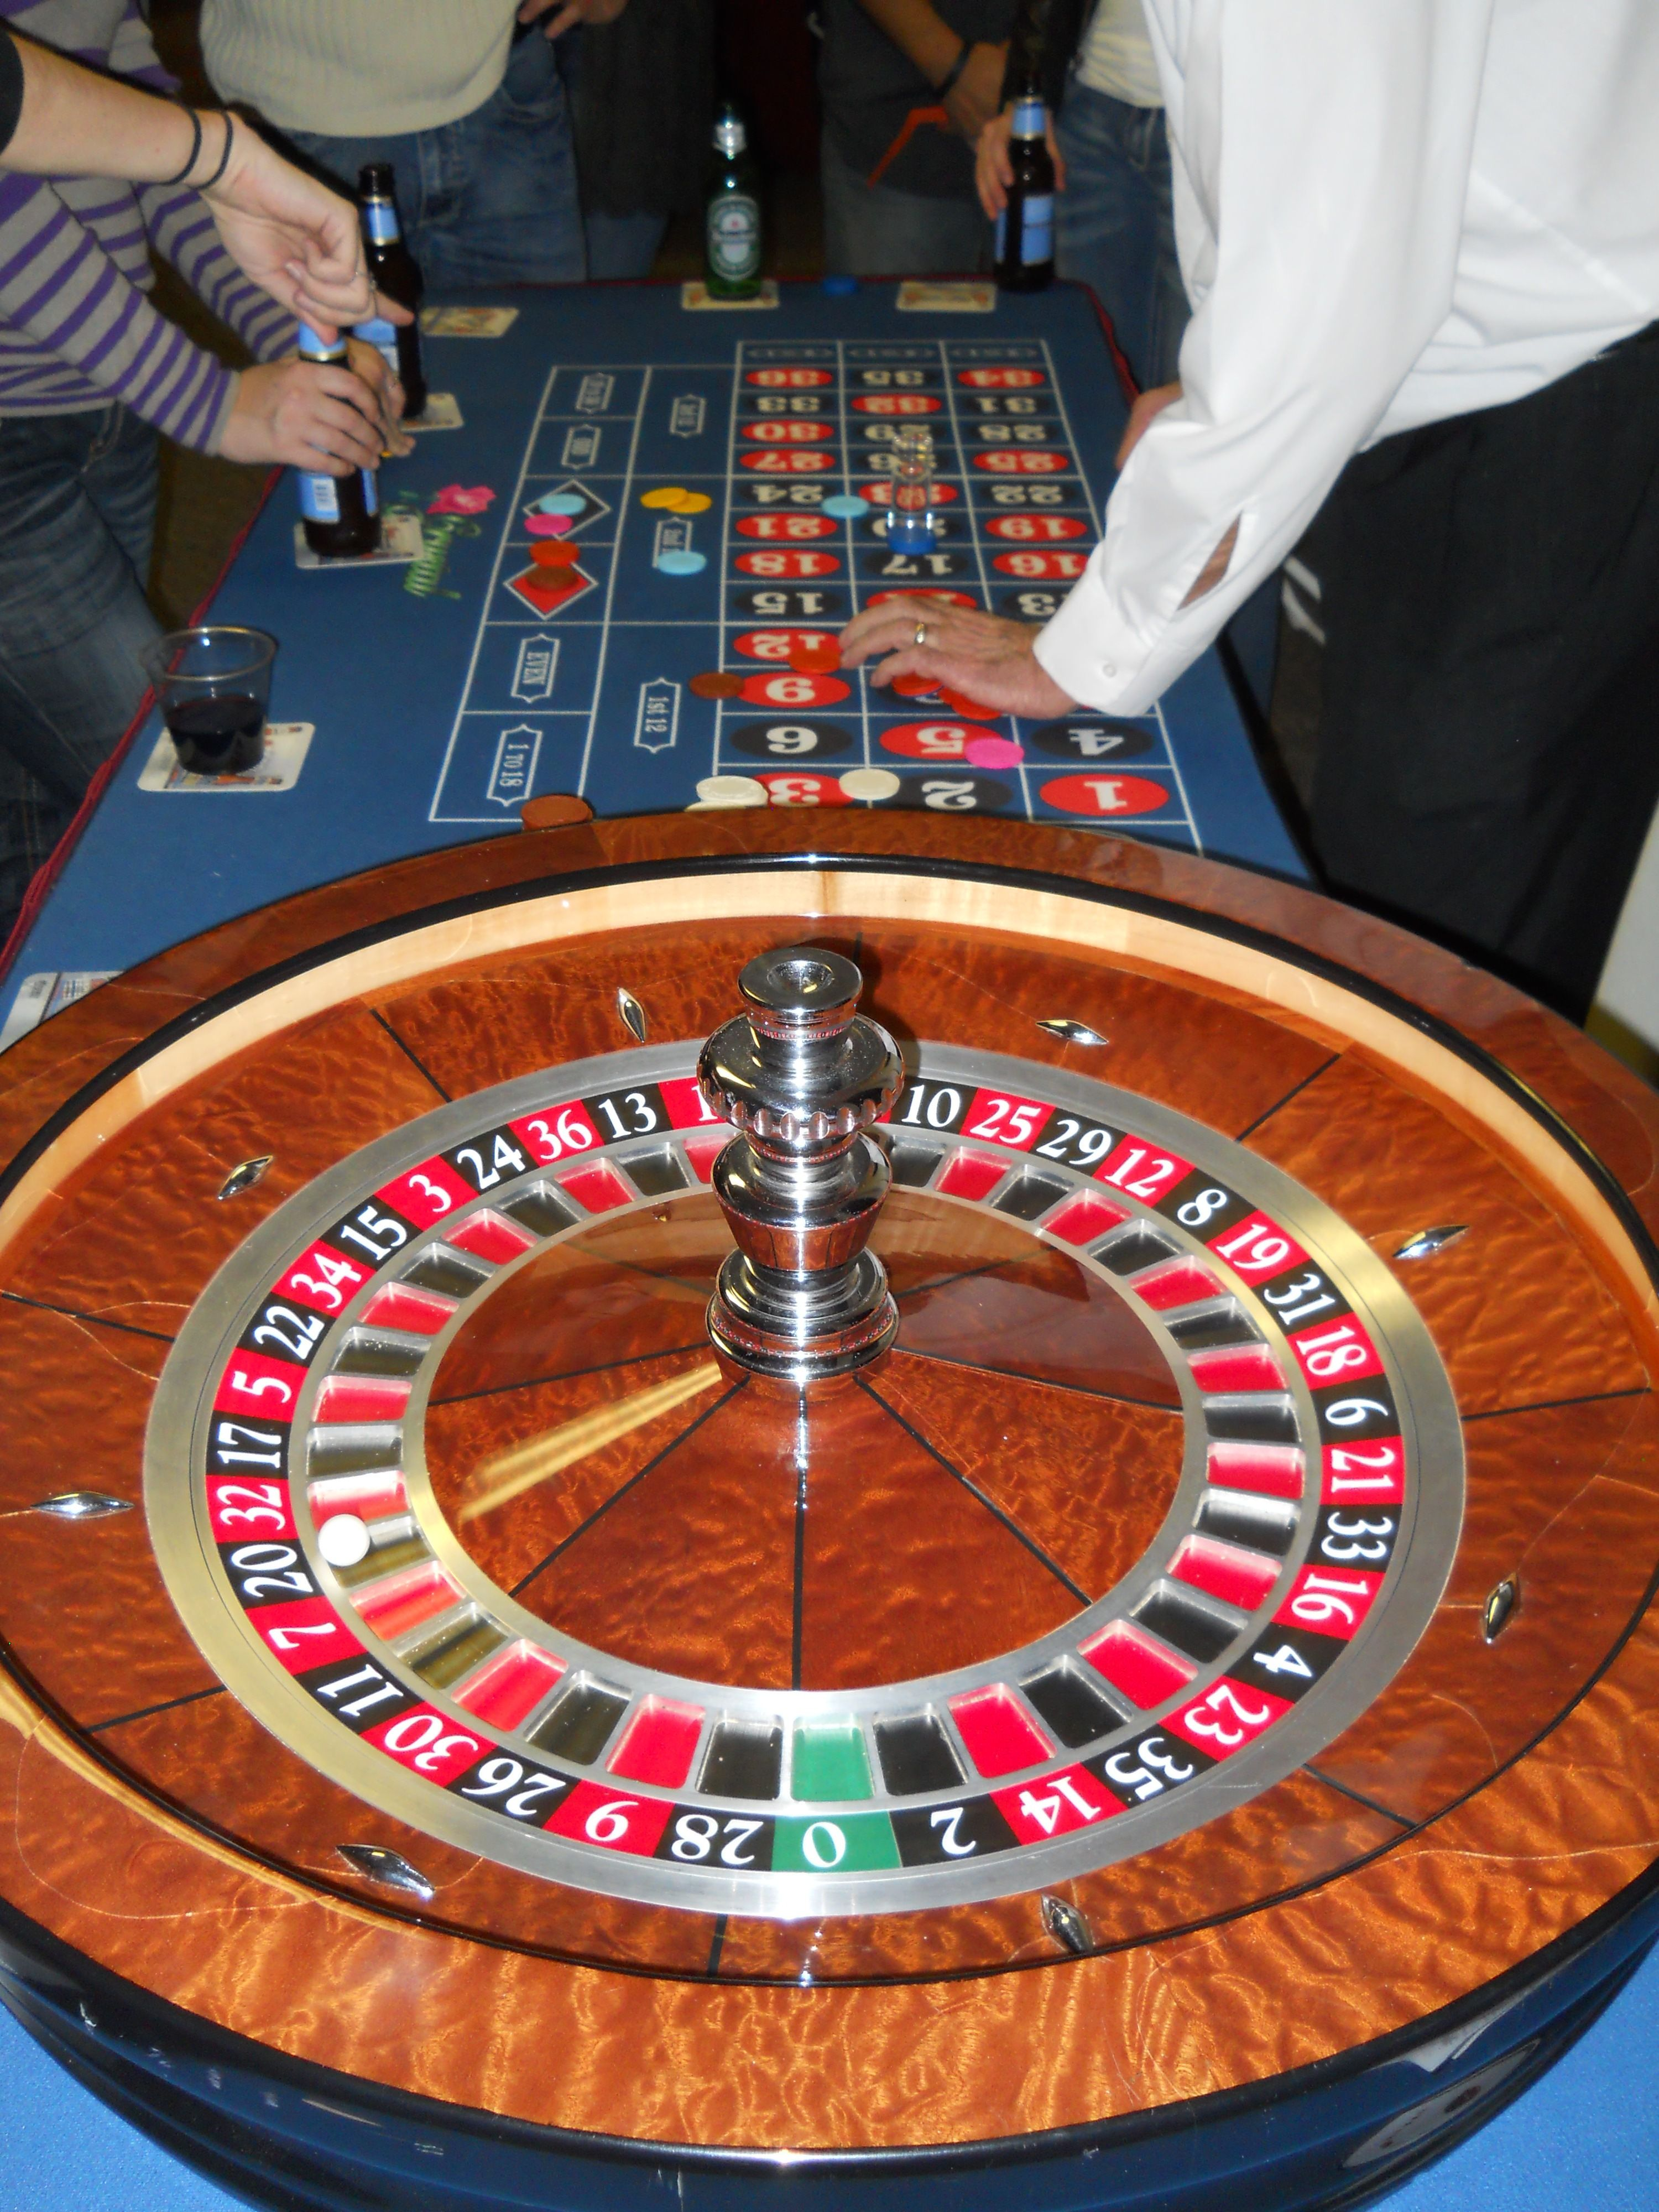 casino night roulette table casino night pinterest. Black Bedroom Furniture Sets. Home Design Ideas